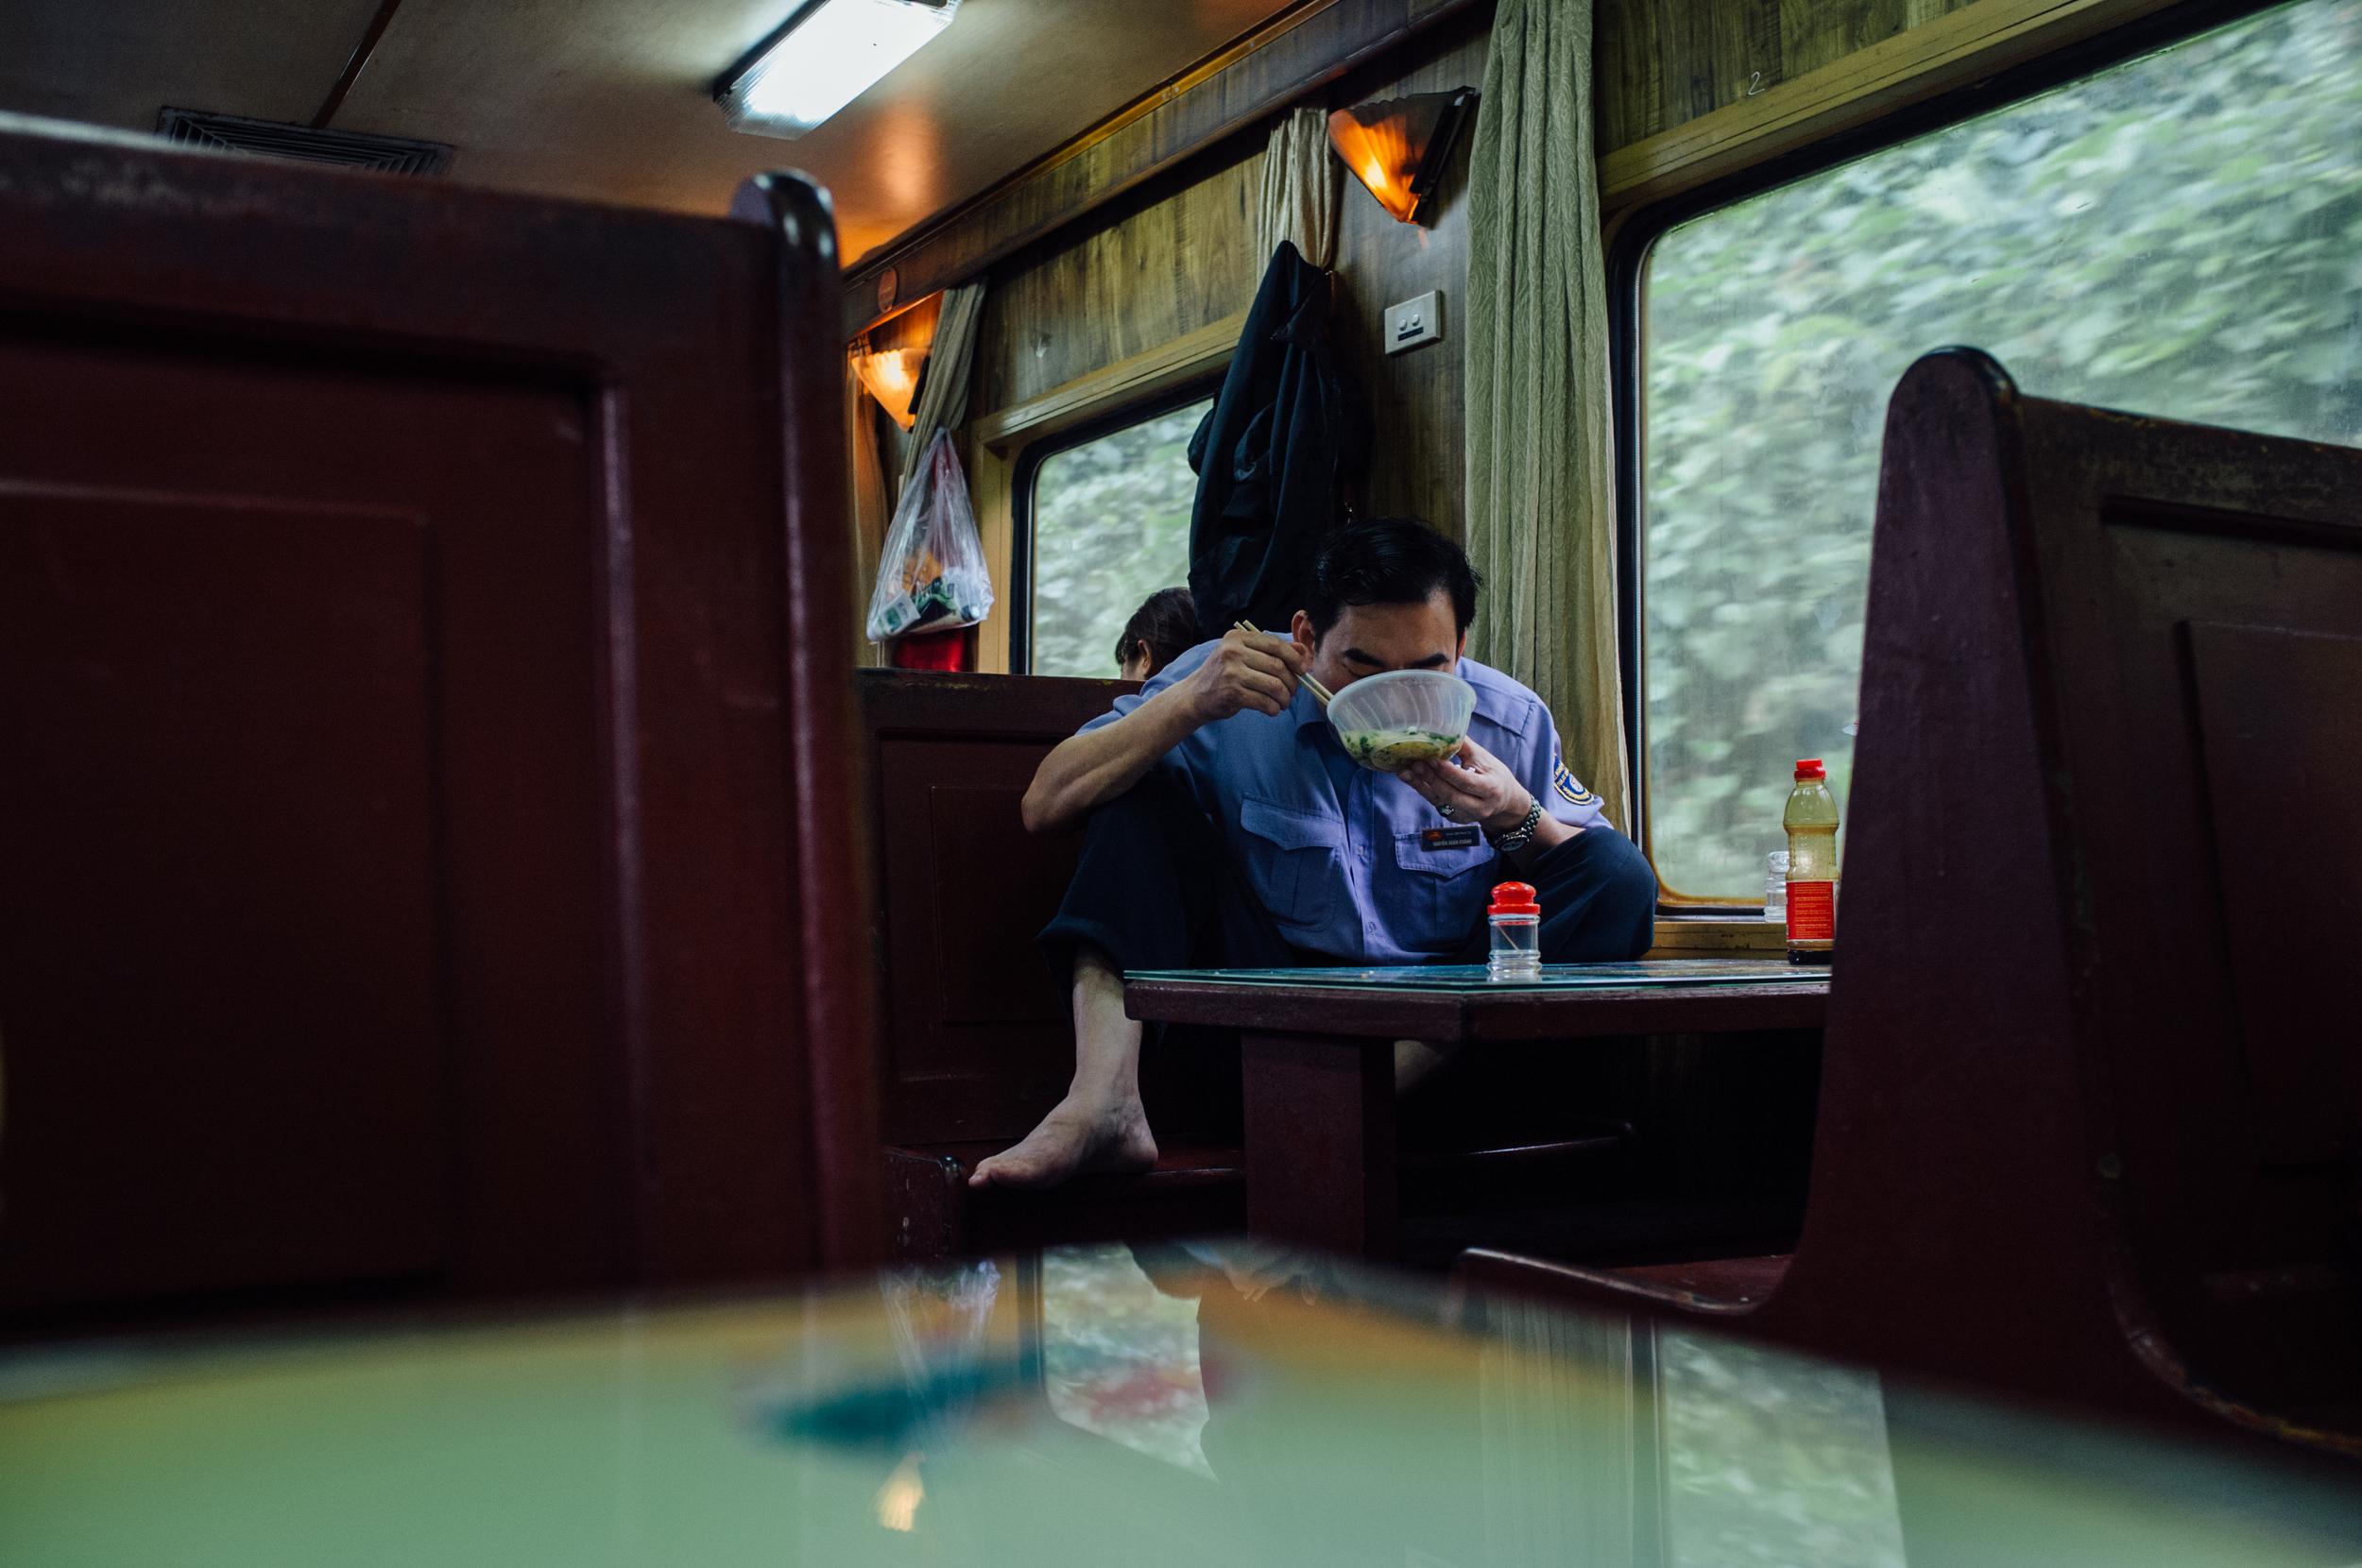 Vietnam Railway employee comfortably enjoying his own breakfast